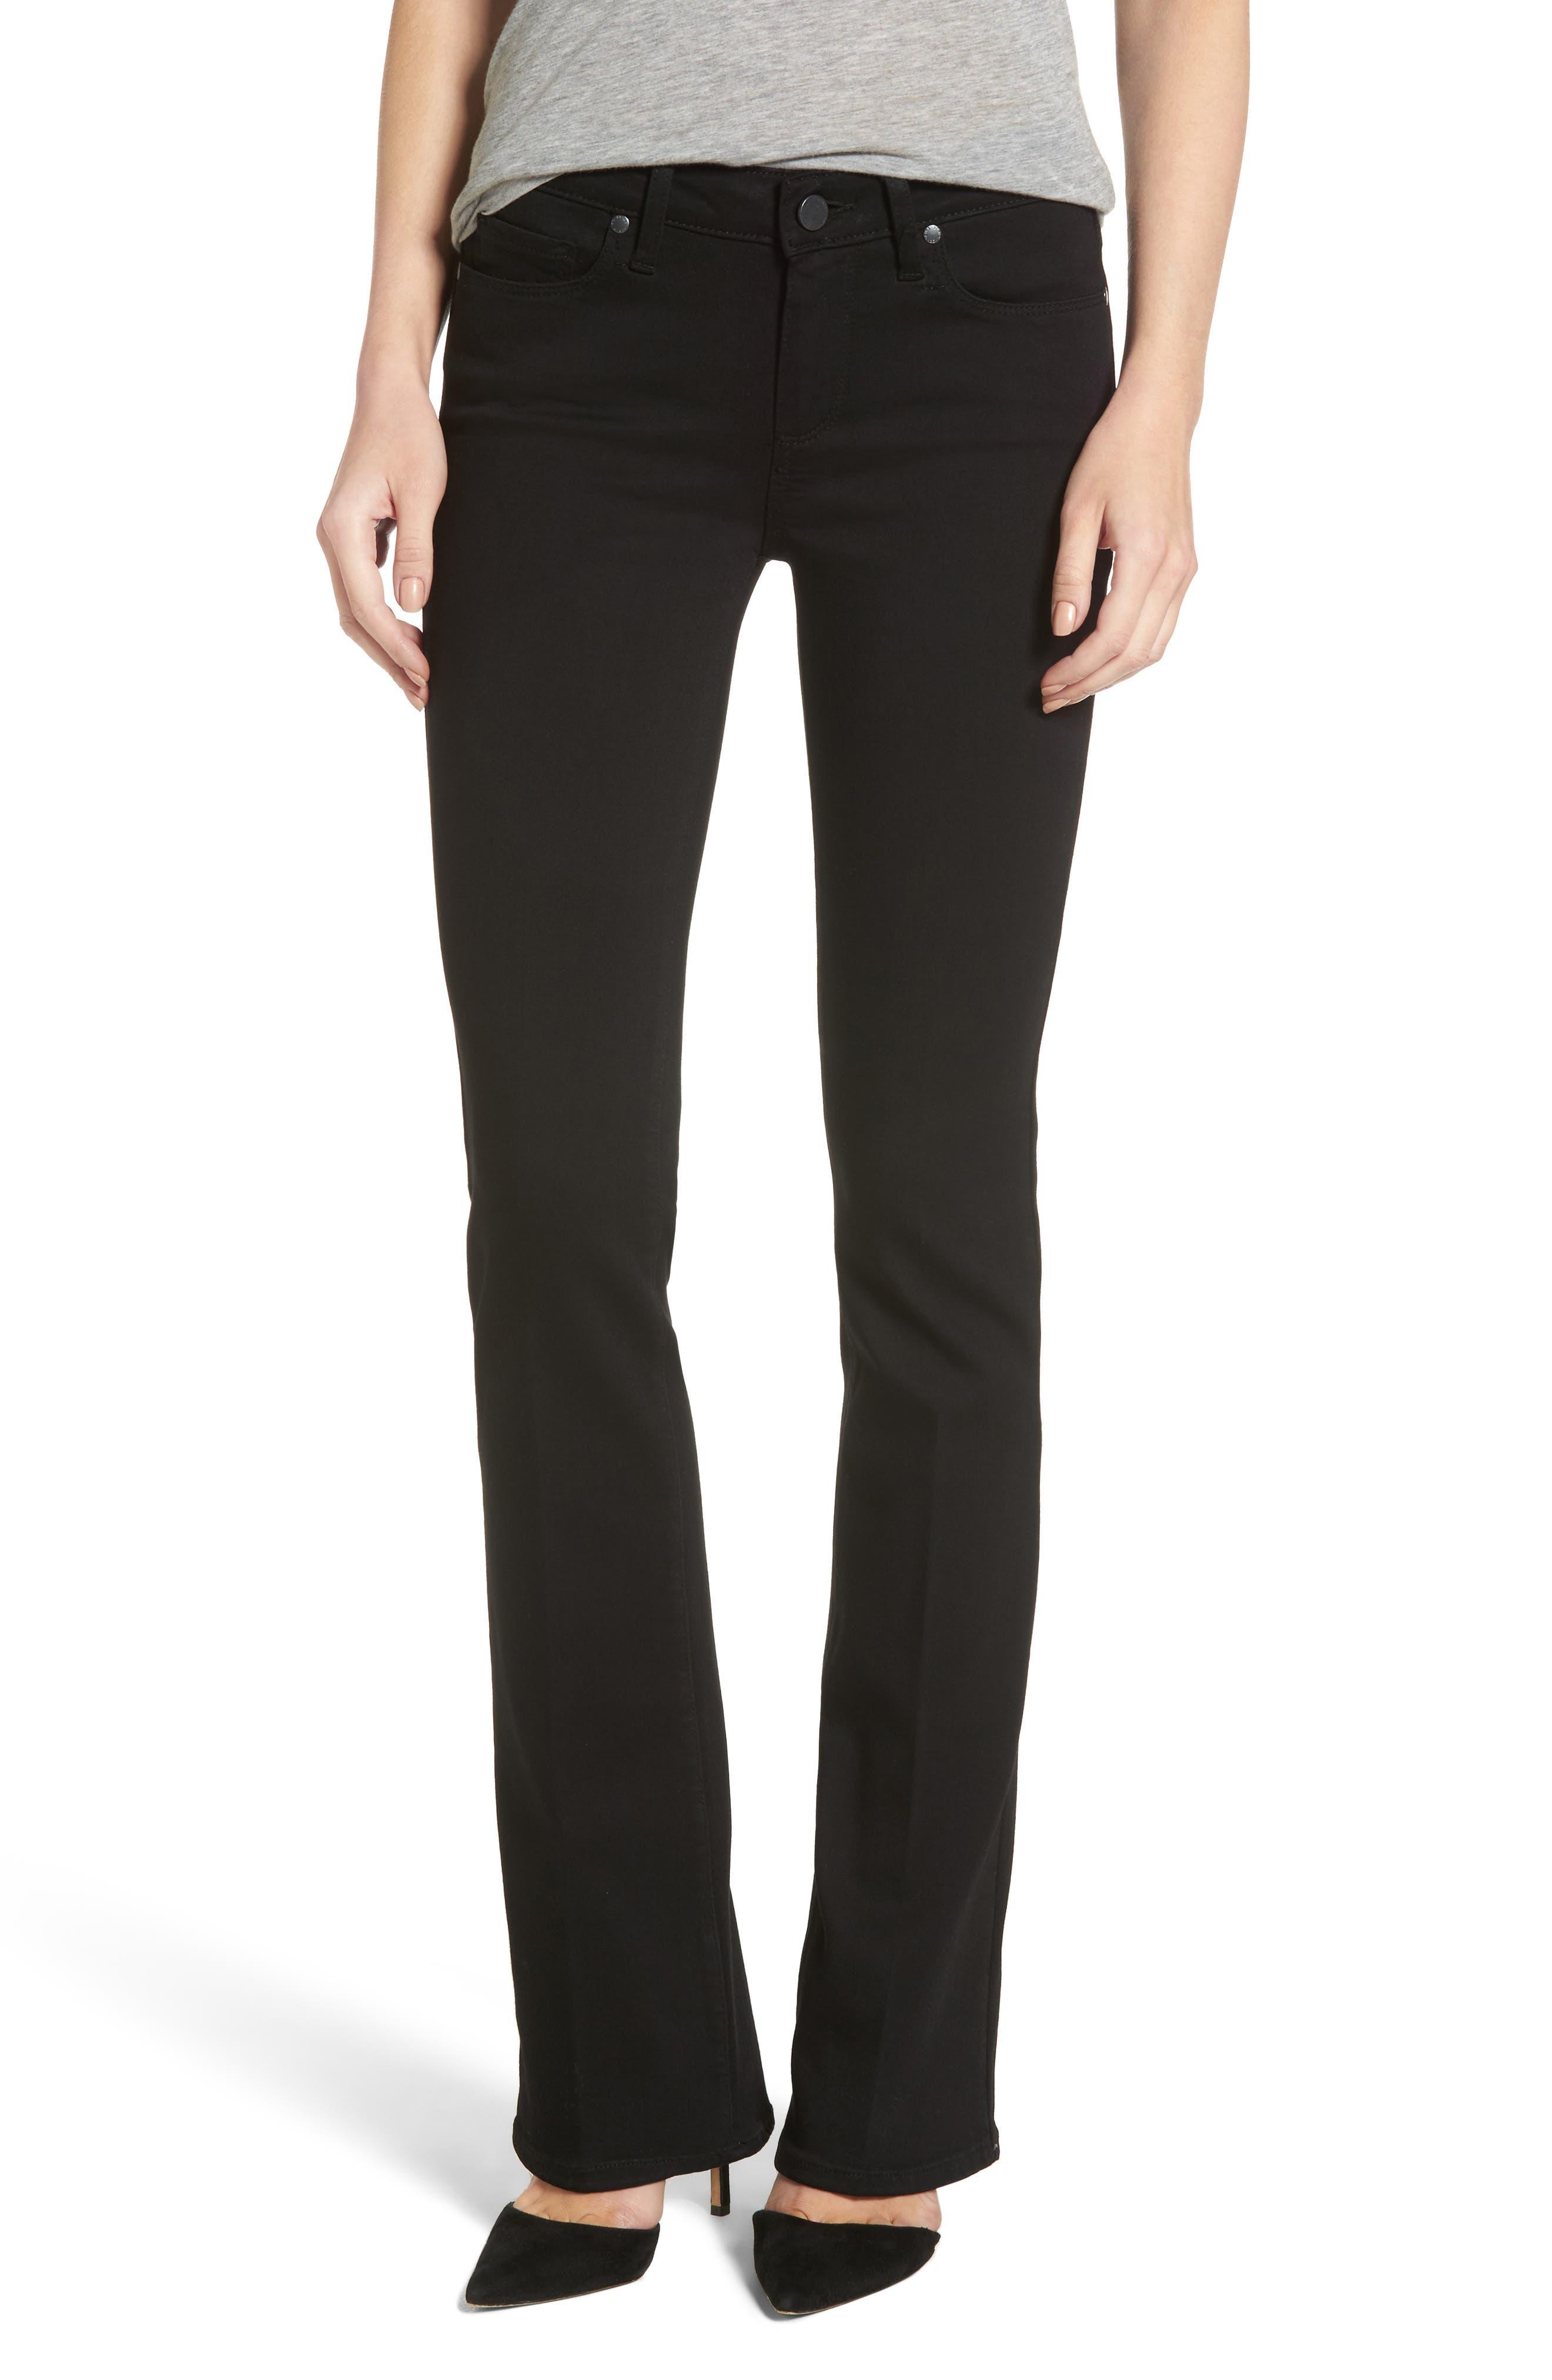 Alternate Image 1 Selected - PAIGE Transcend - Manhattan Bootcut Jeans (Black Shadow)